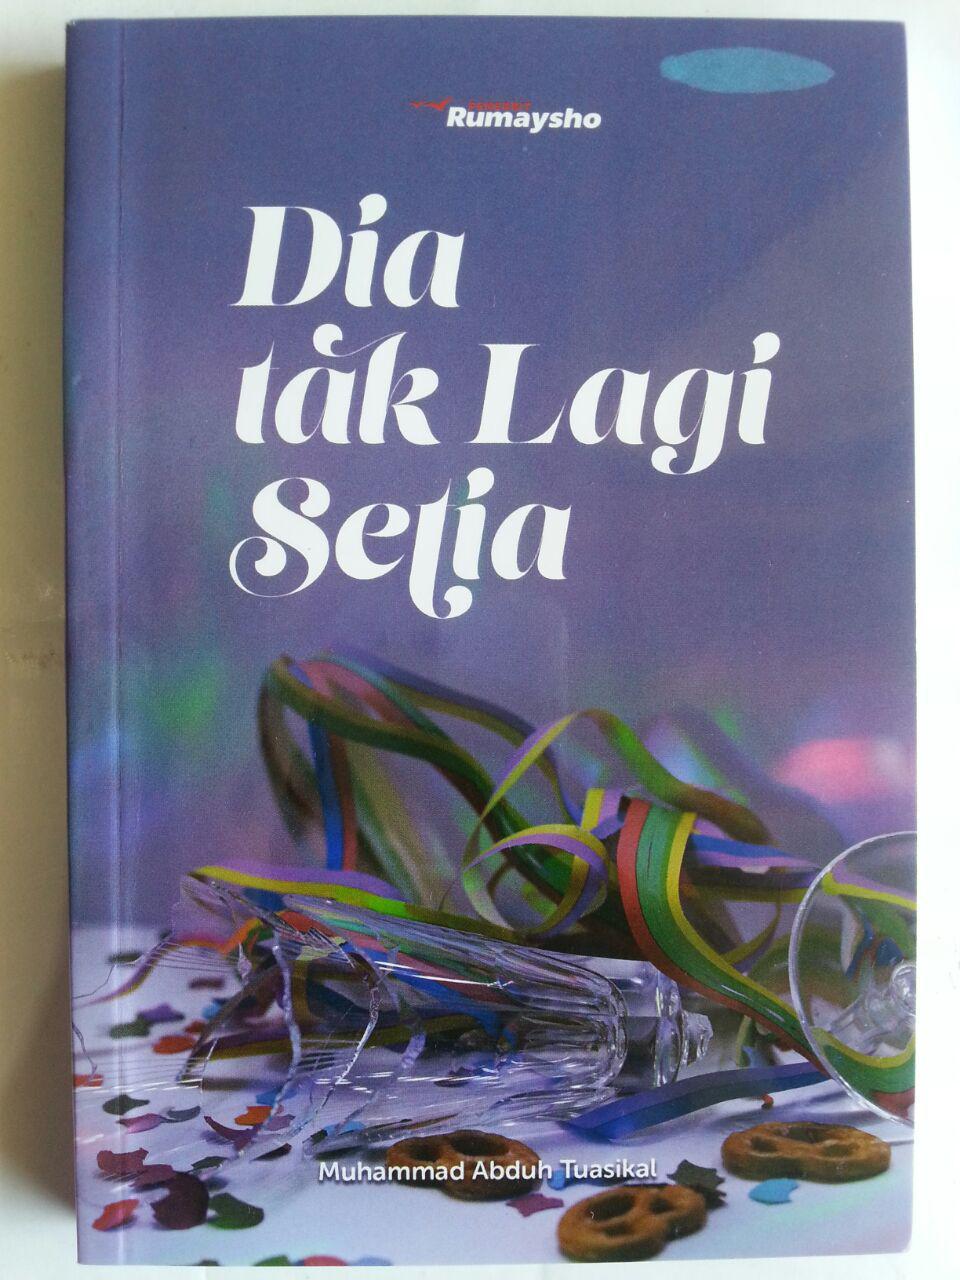 Buku Dia Tak Lagi Setia cover 2